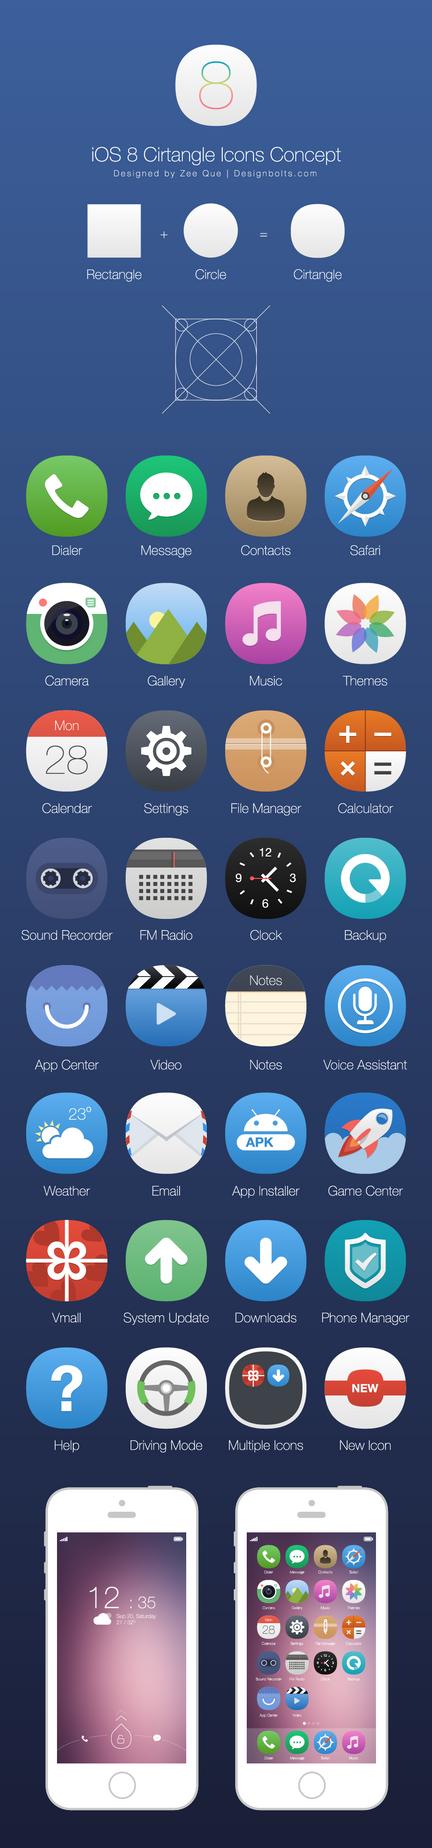 iOS 8 Icons Concept by Designbolts